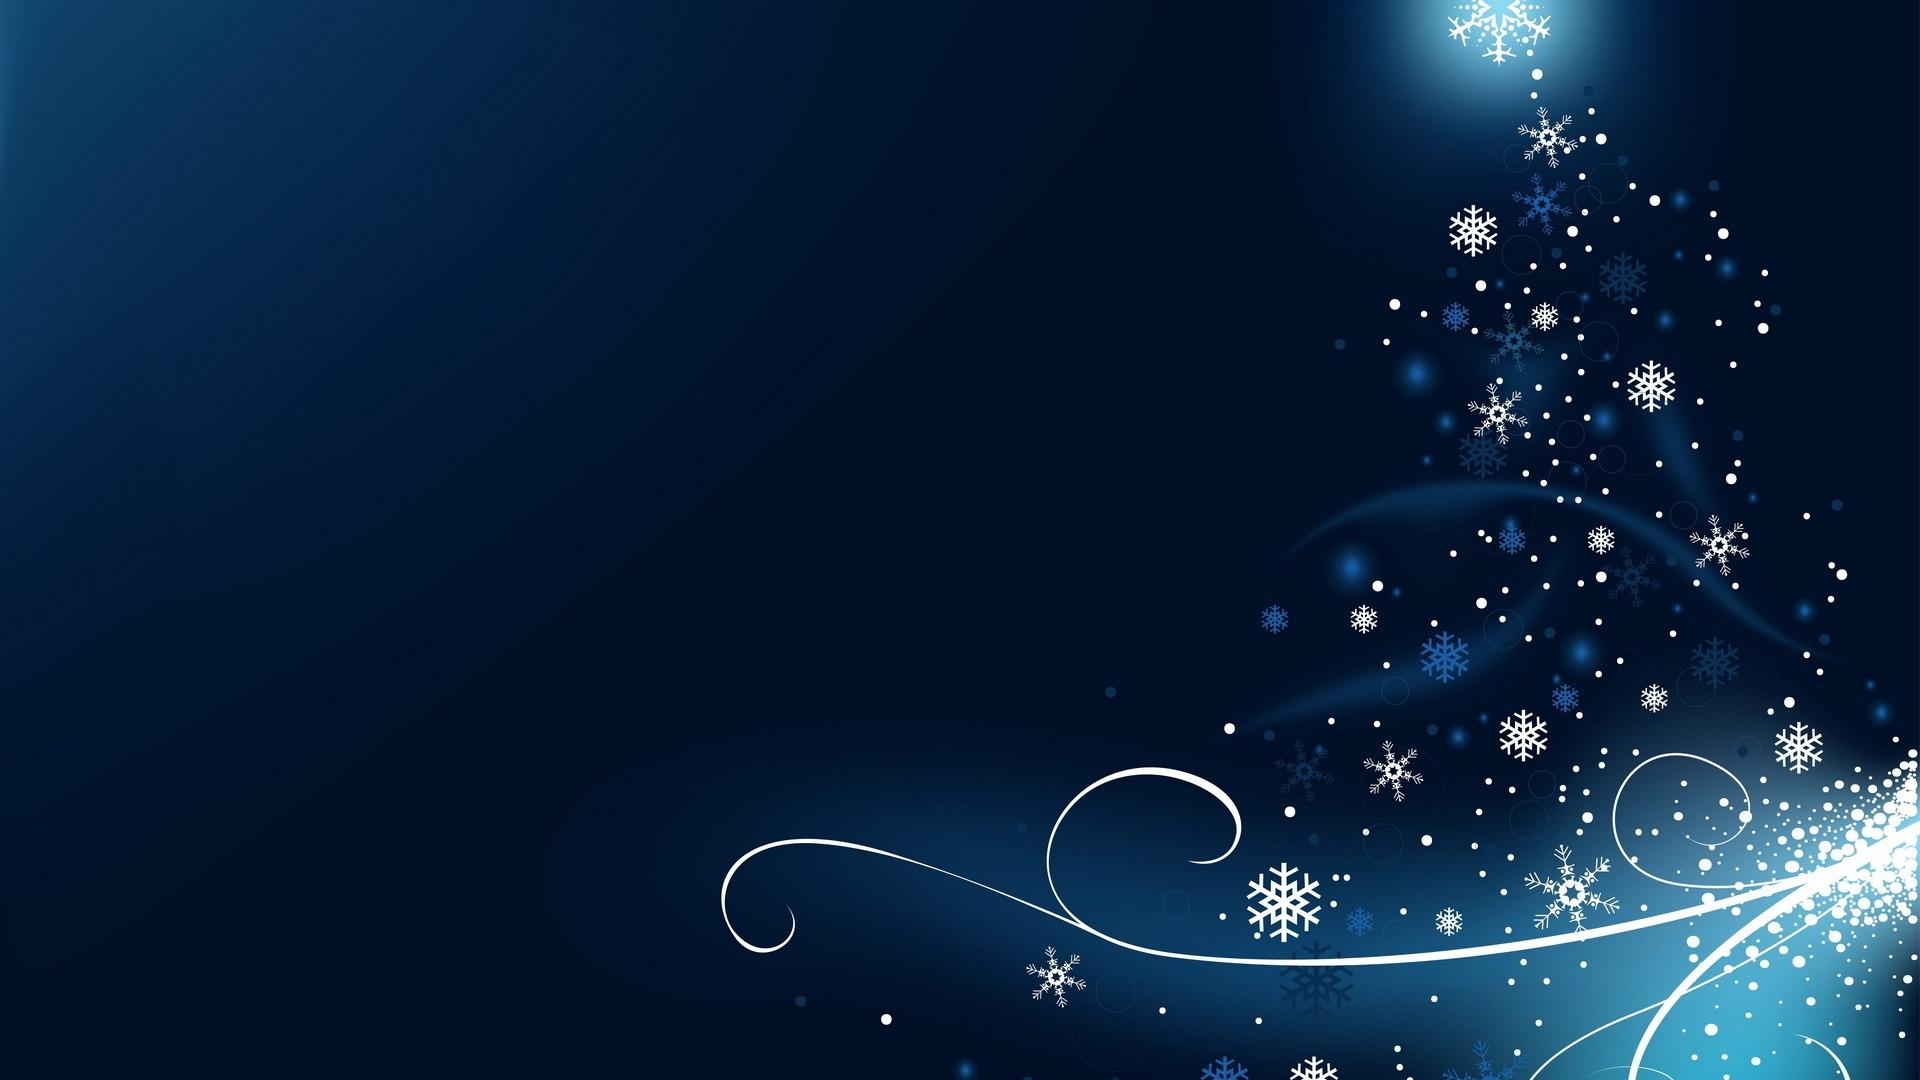 17 Wonderful HD Snowflakes Wallpapers - HDWallSource.com